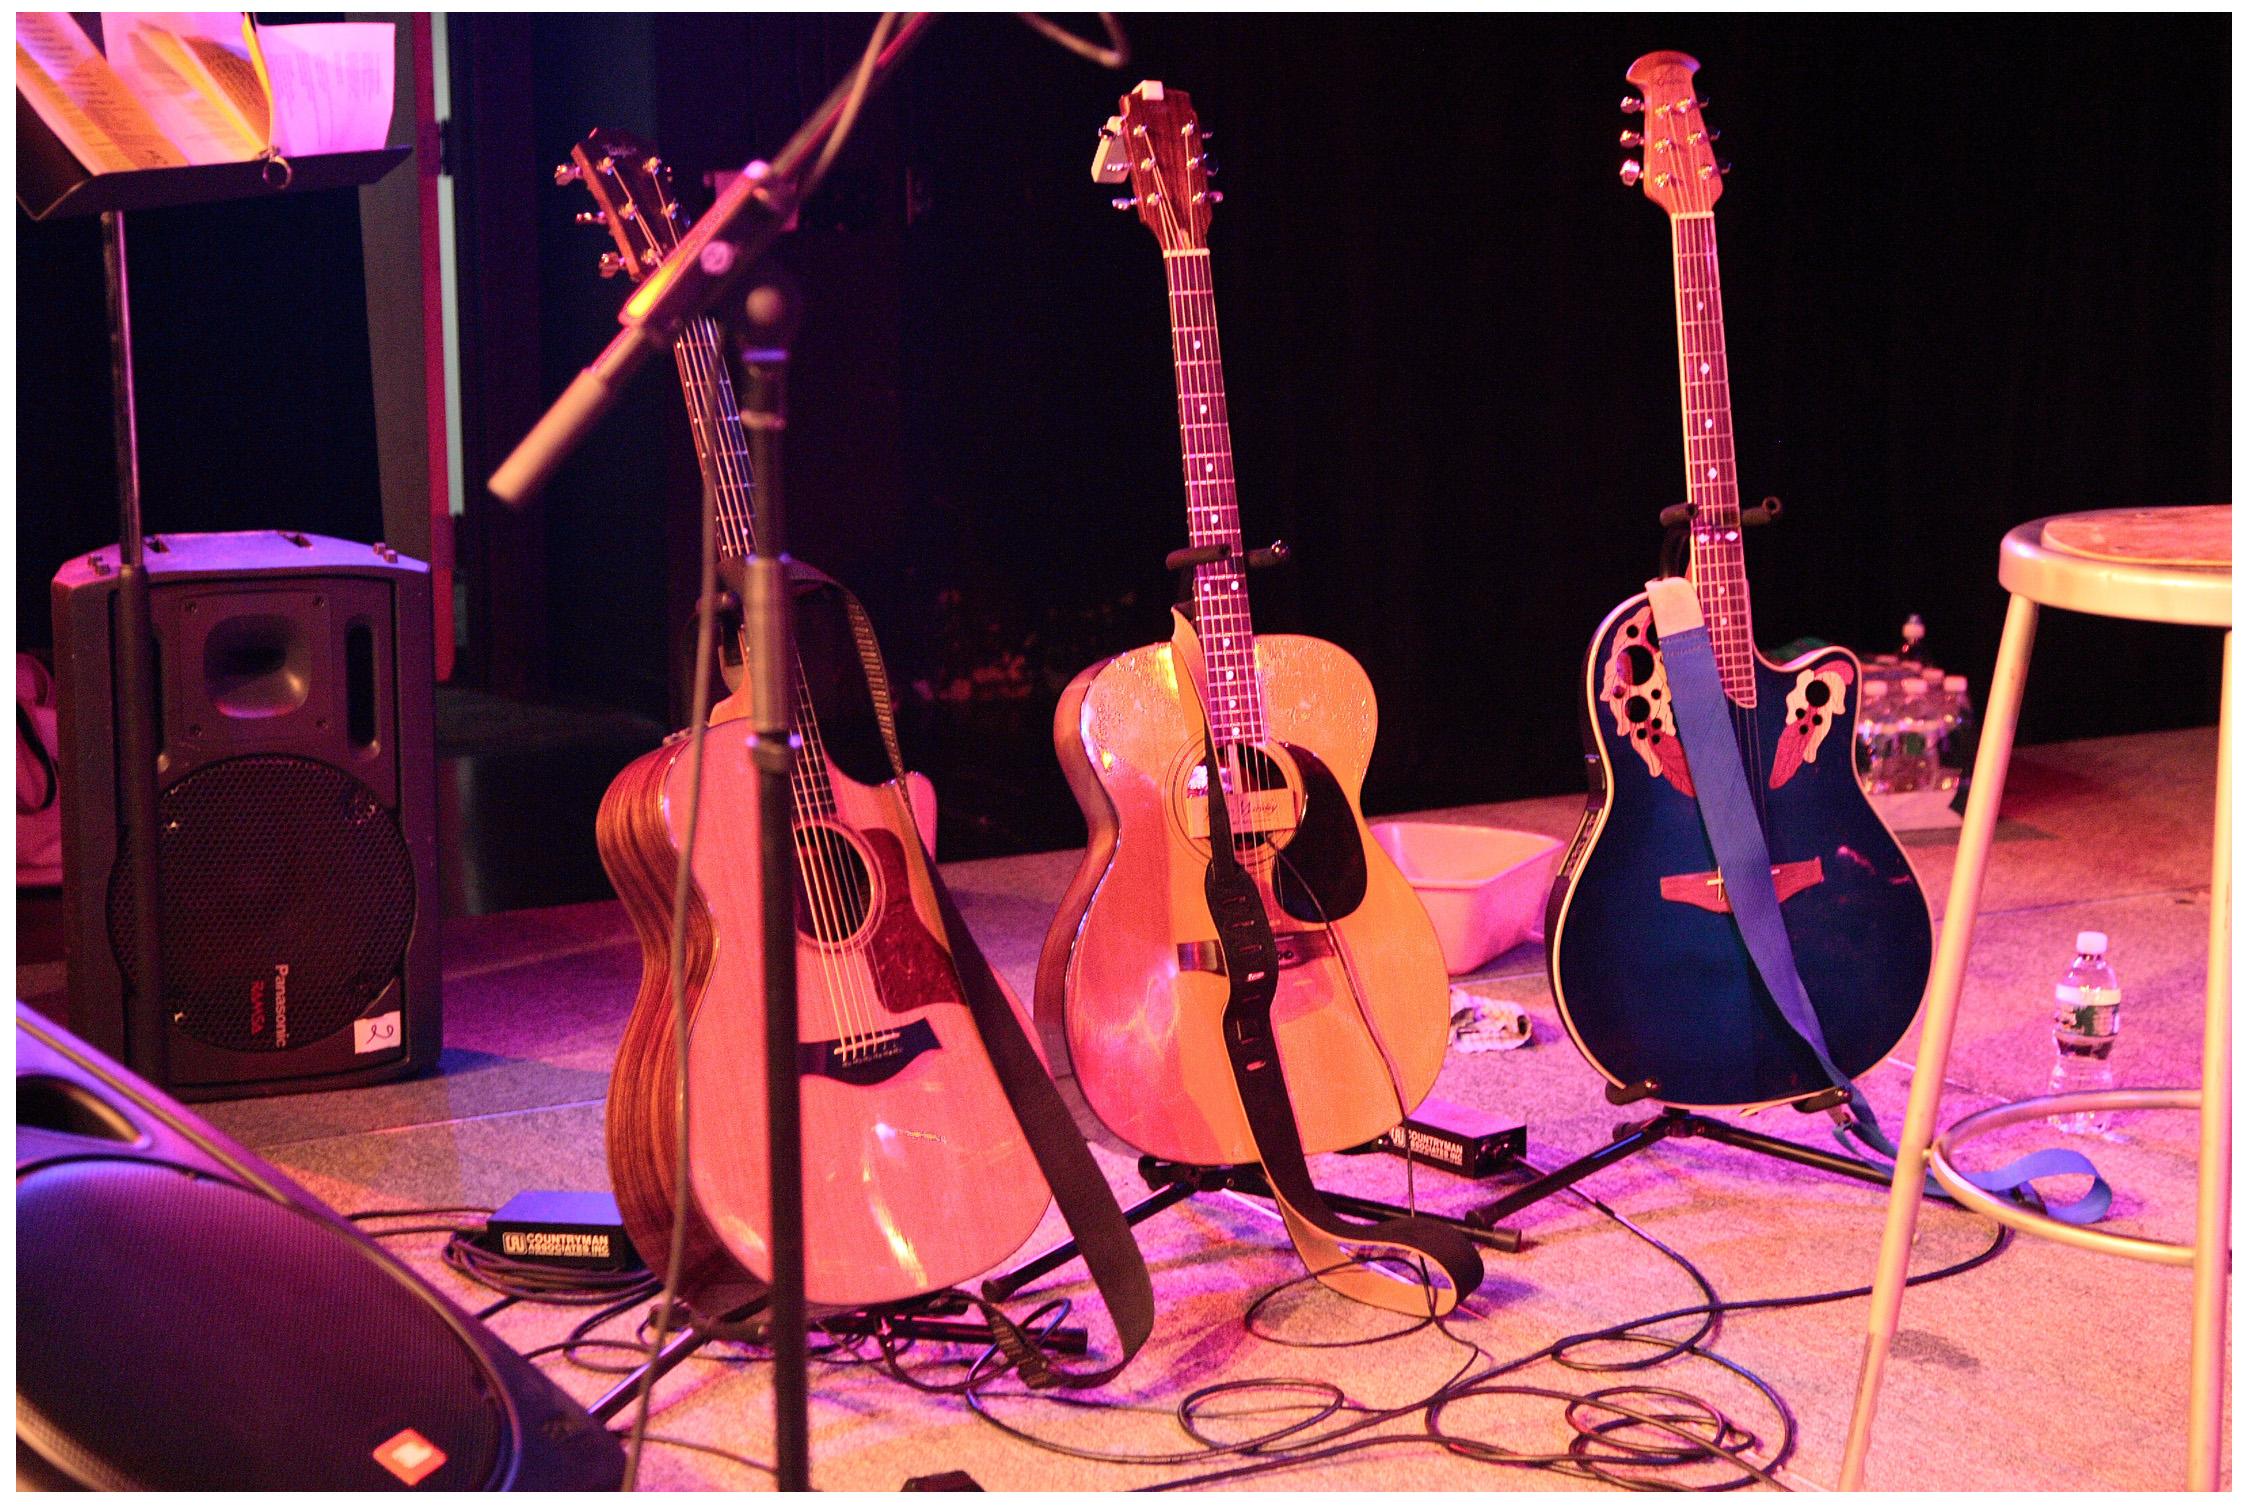 guitarshomebd